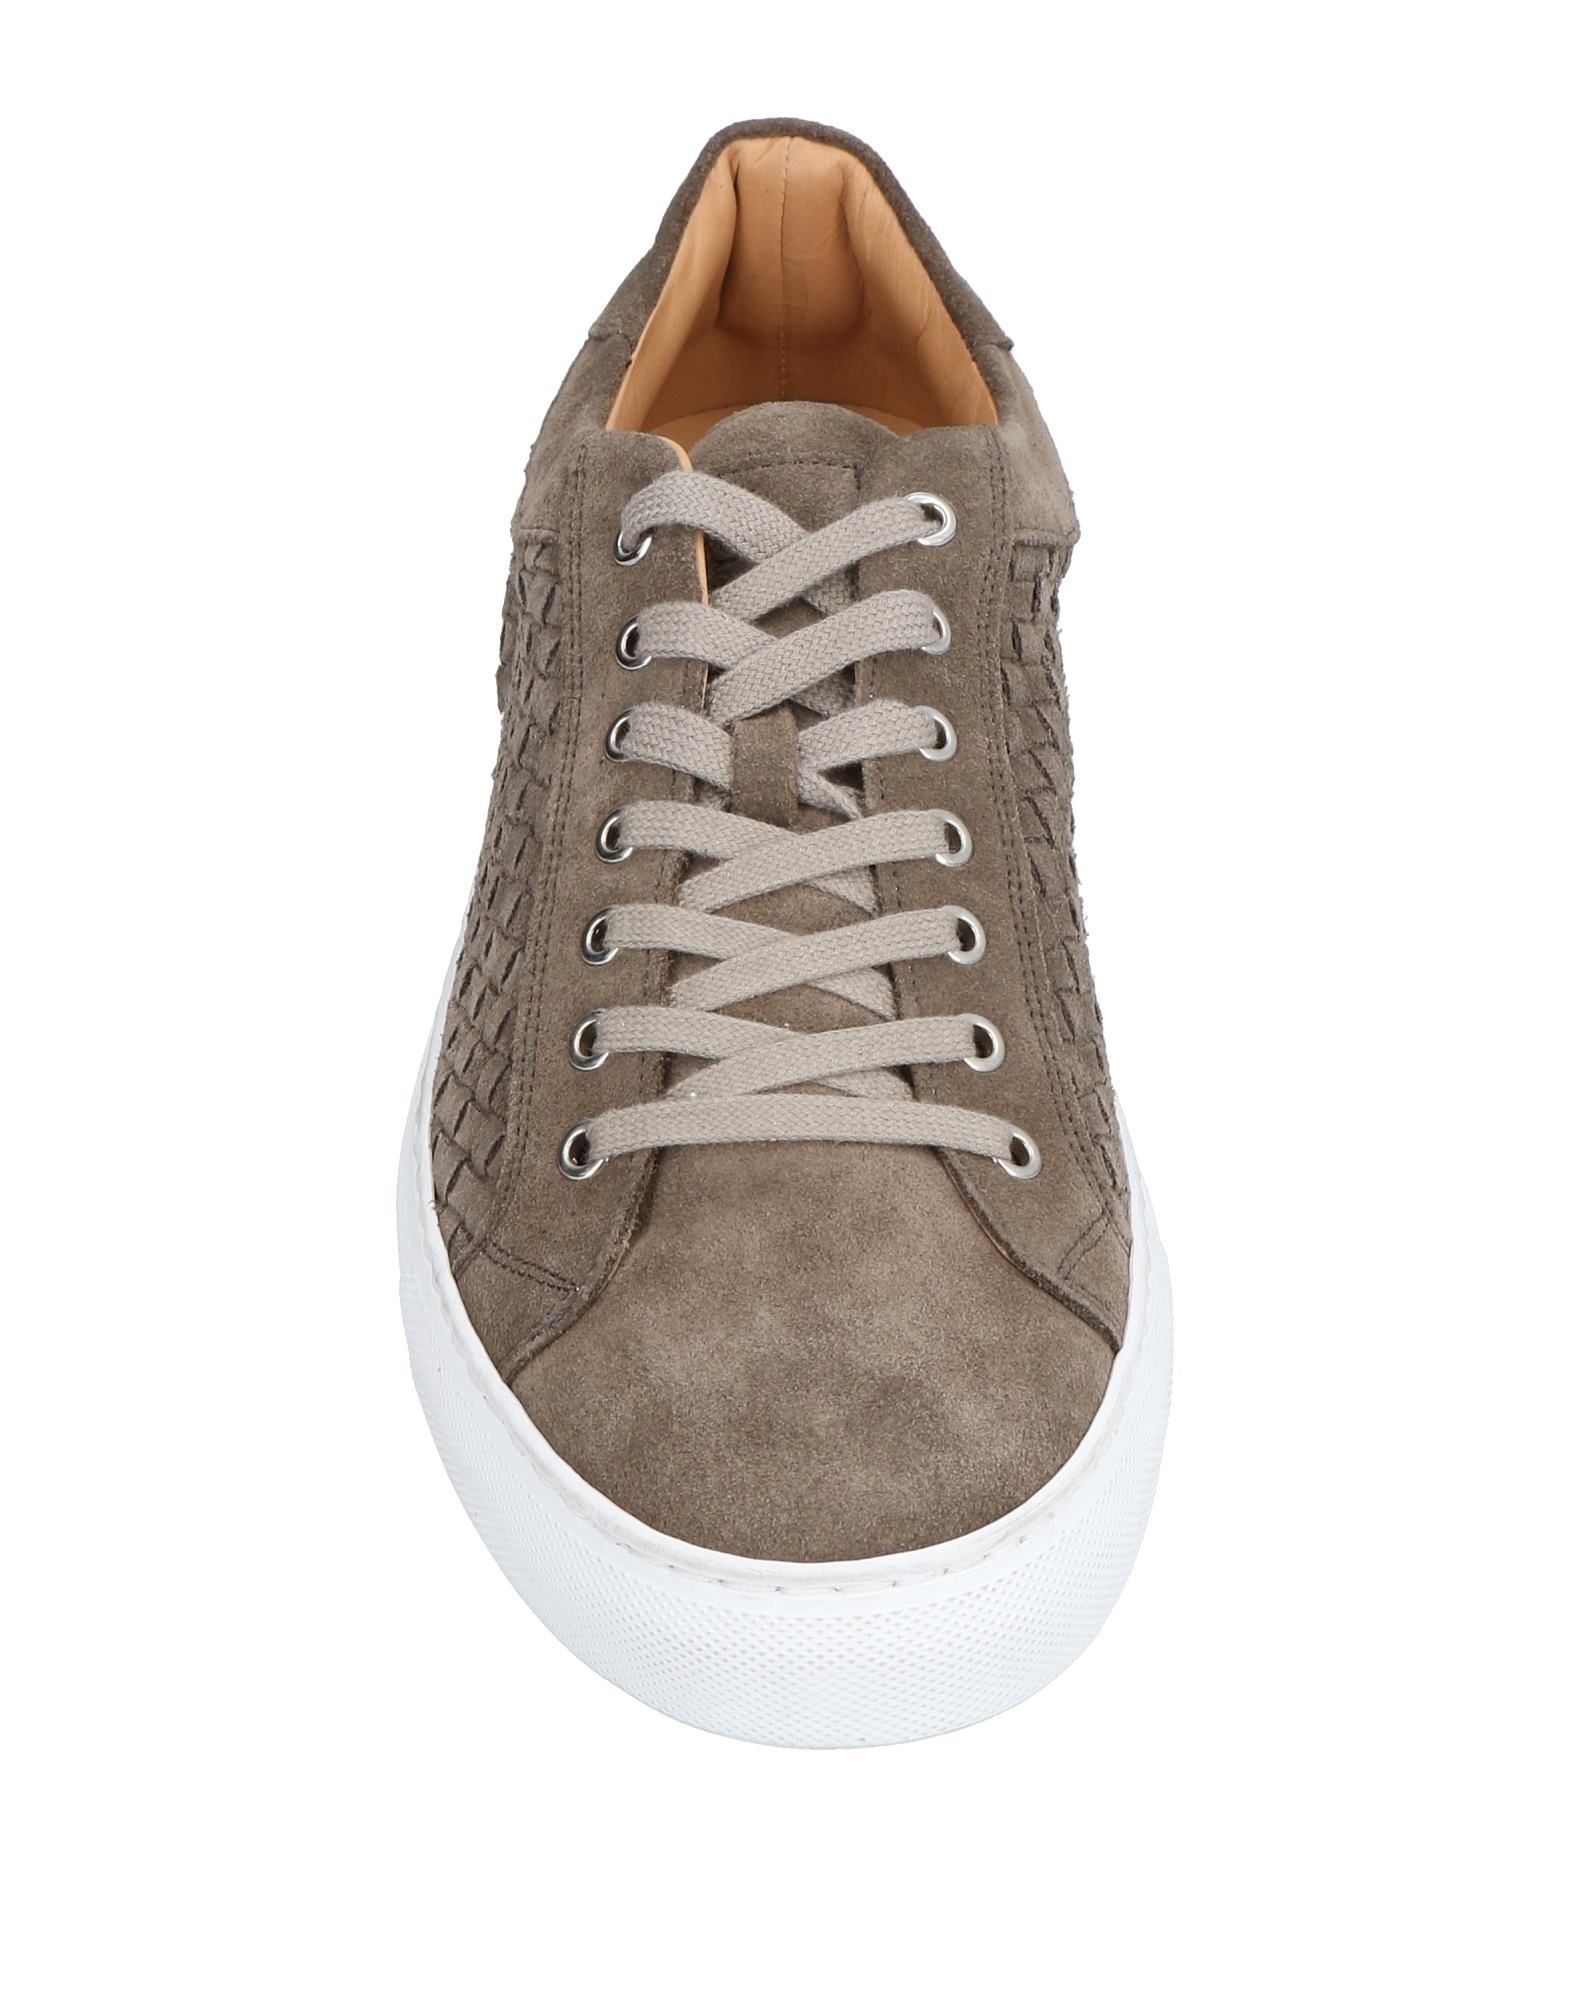 Rabatt echte Parma Schuhe Pellettieri Di  Parma echte Sneakers Herren  11505419WK 7bd150